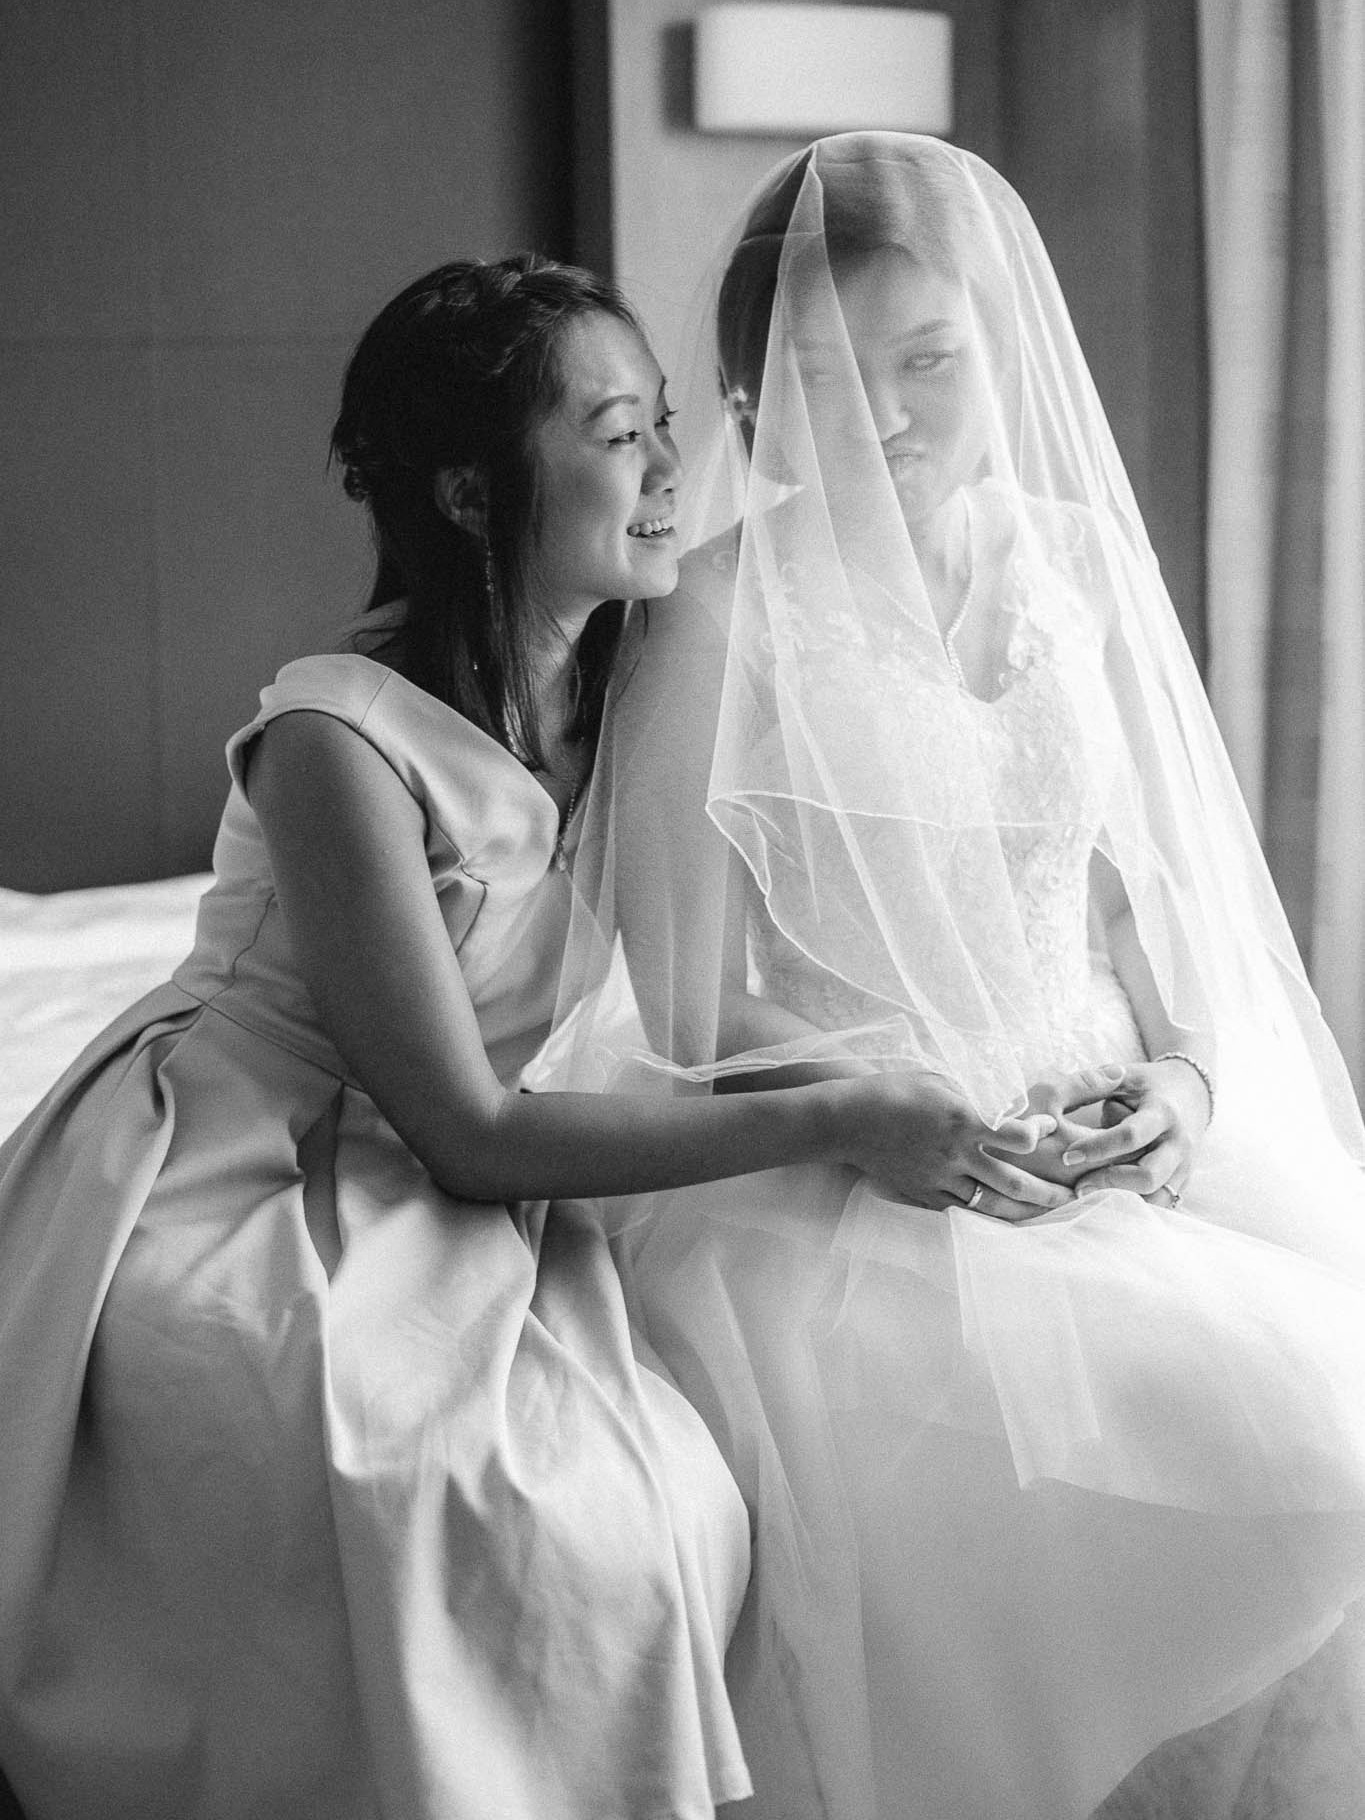 singapore-wedding-photographer-malay-indian-pre-wedding-travel-wmt-2015-jeremy-larissa-14.jpg